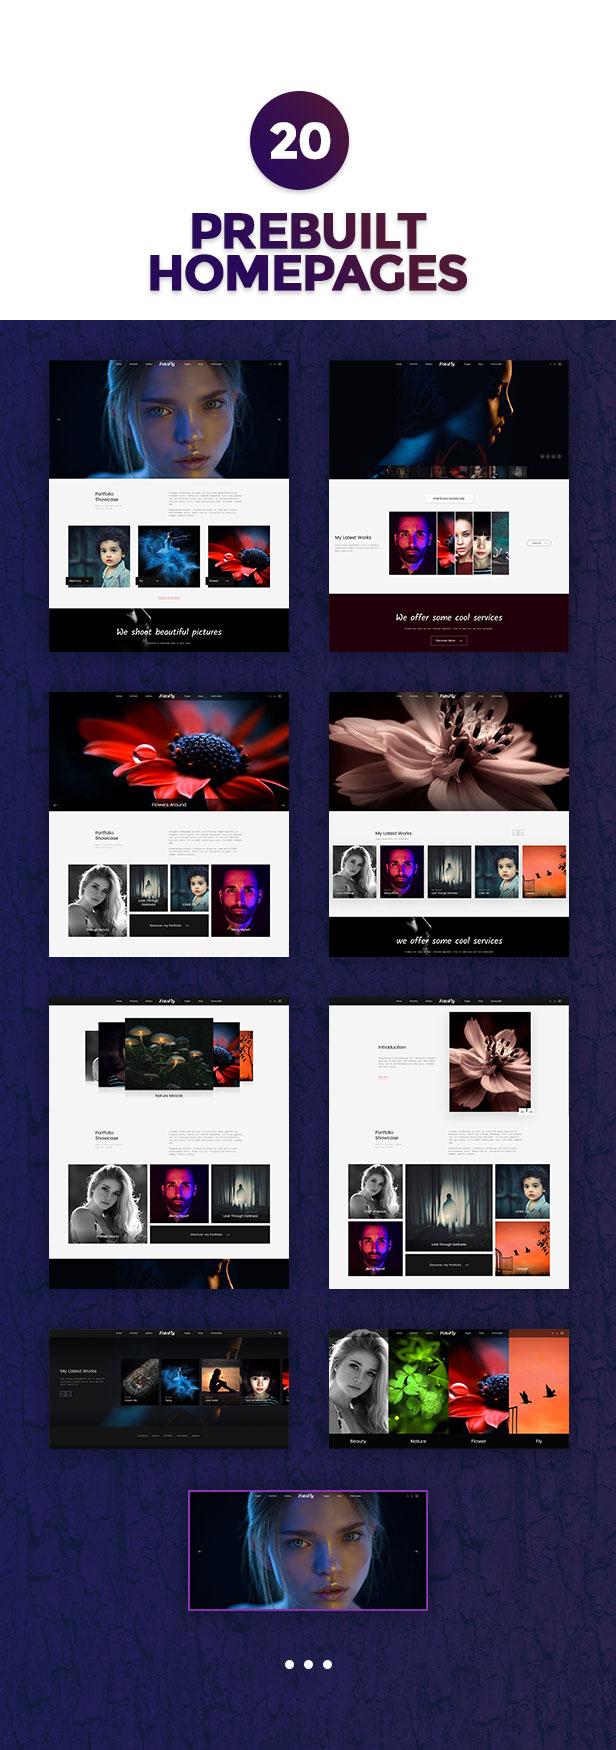 Fotofly - Photography WordPress Theme 5